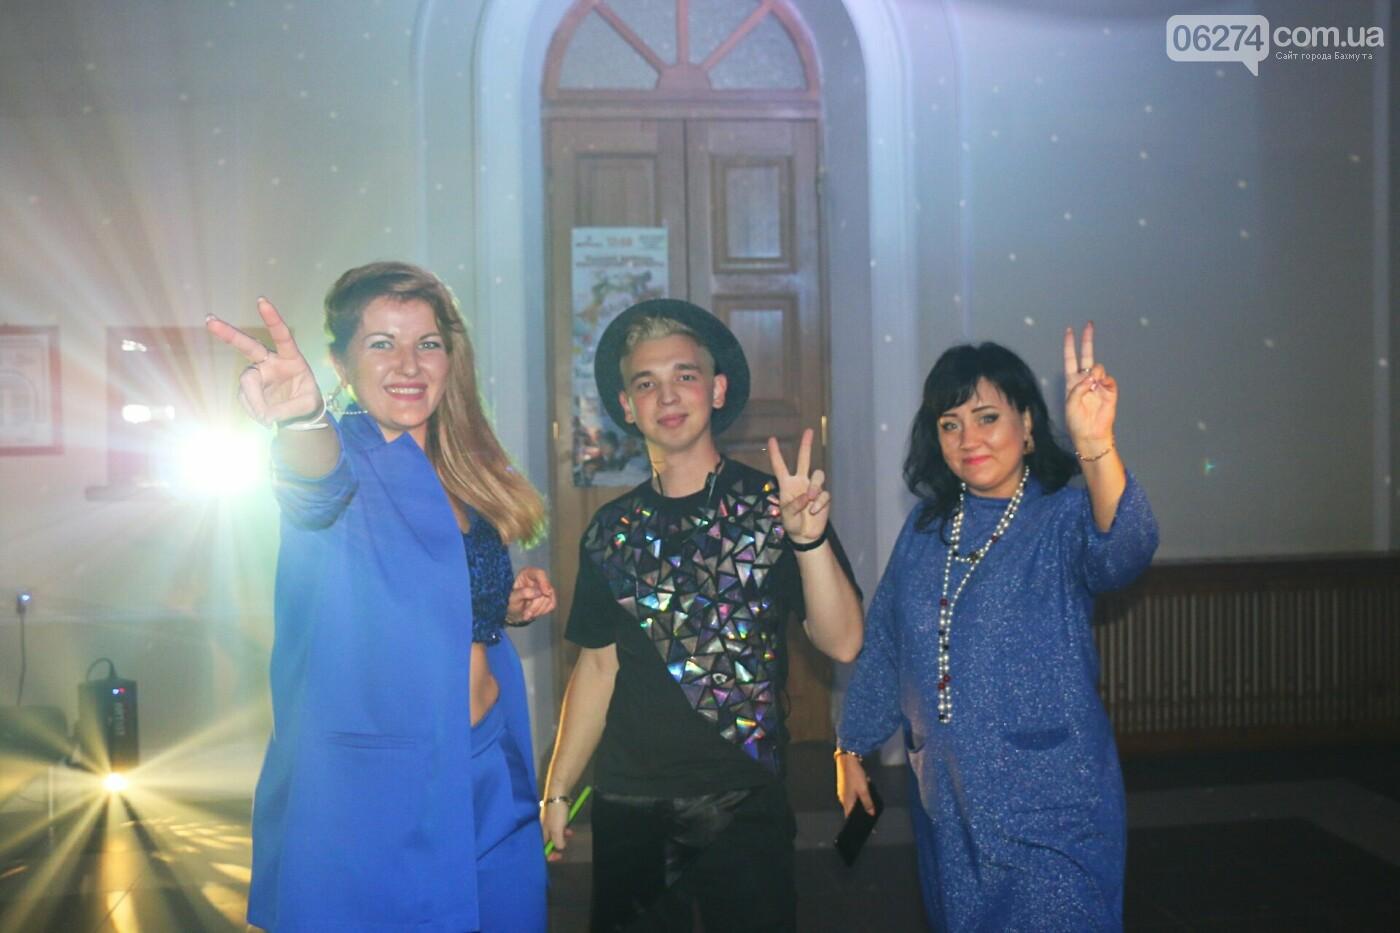 В Бахмуте провели Disco House Party (ФОТООТЧЕТ), фото-42